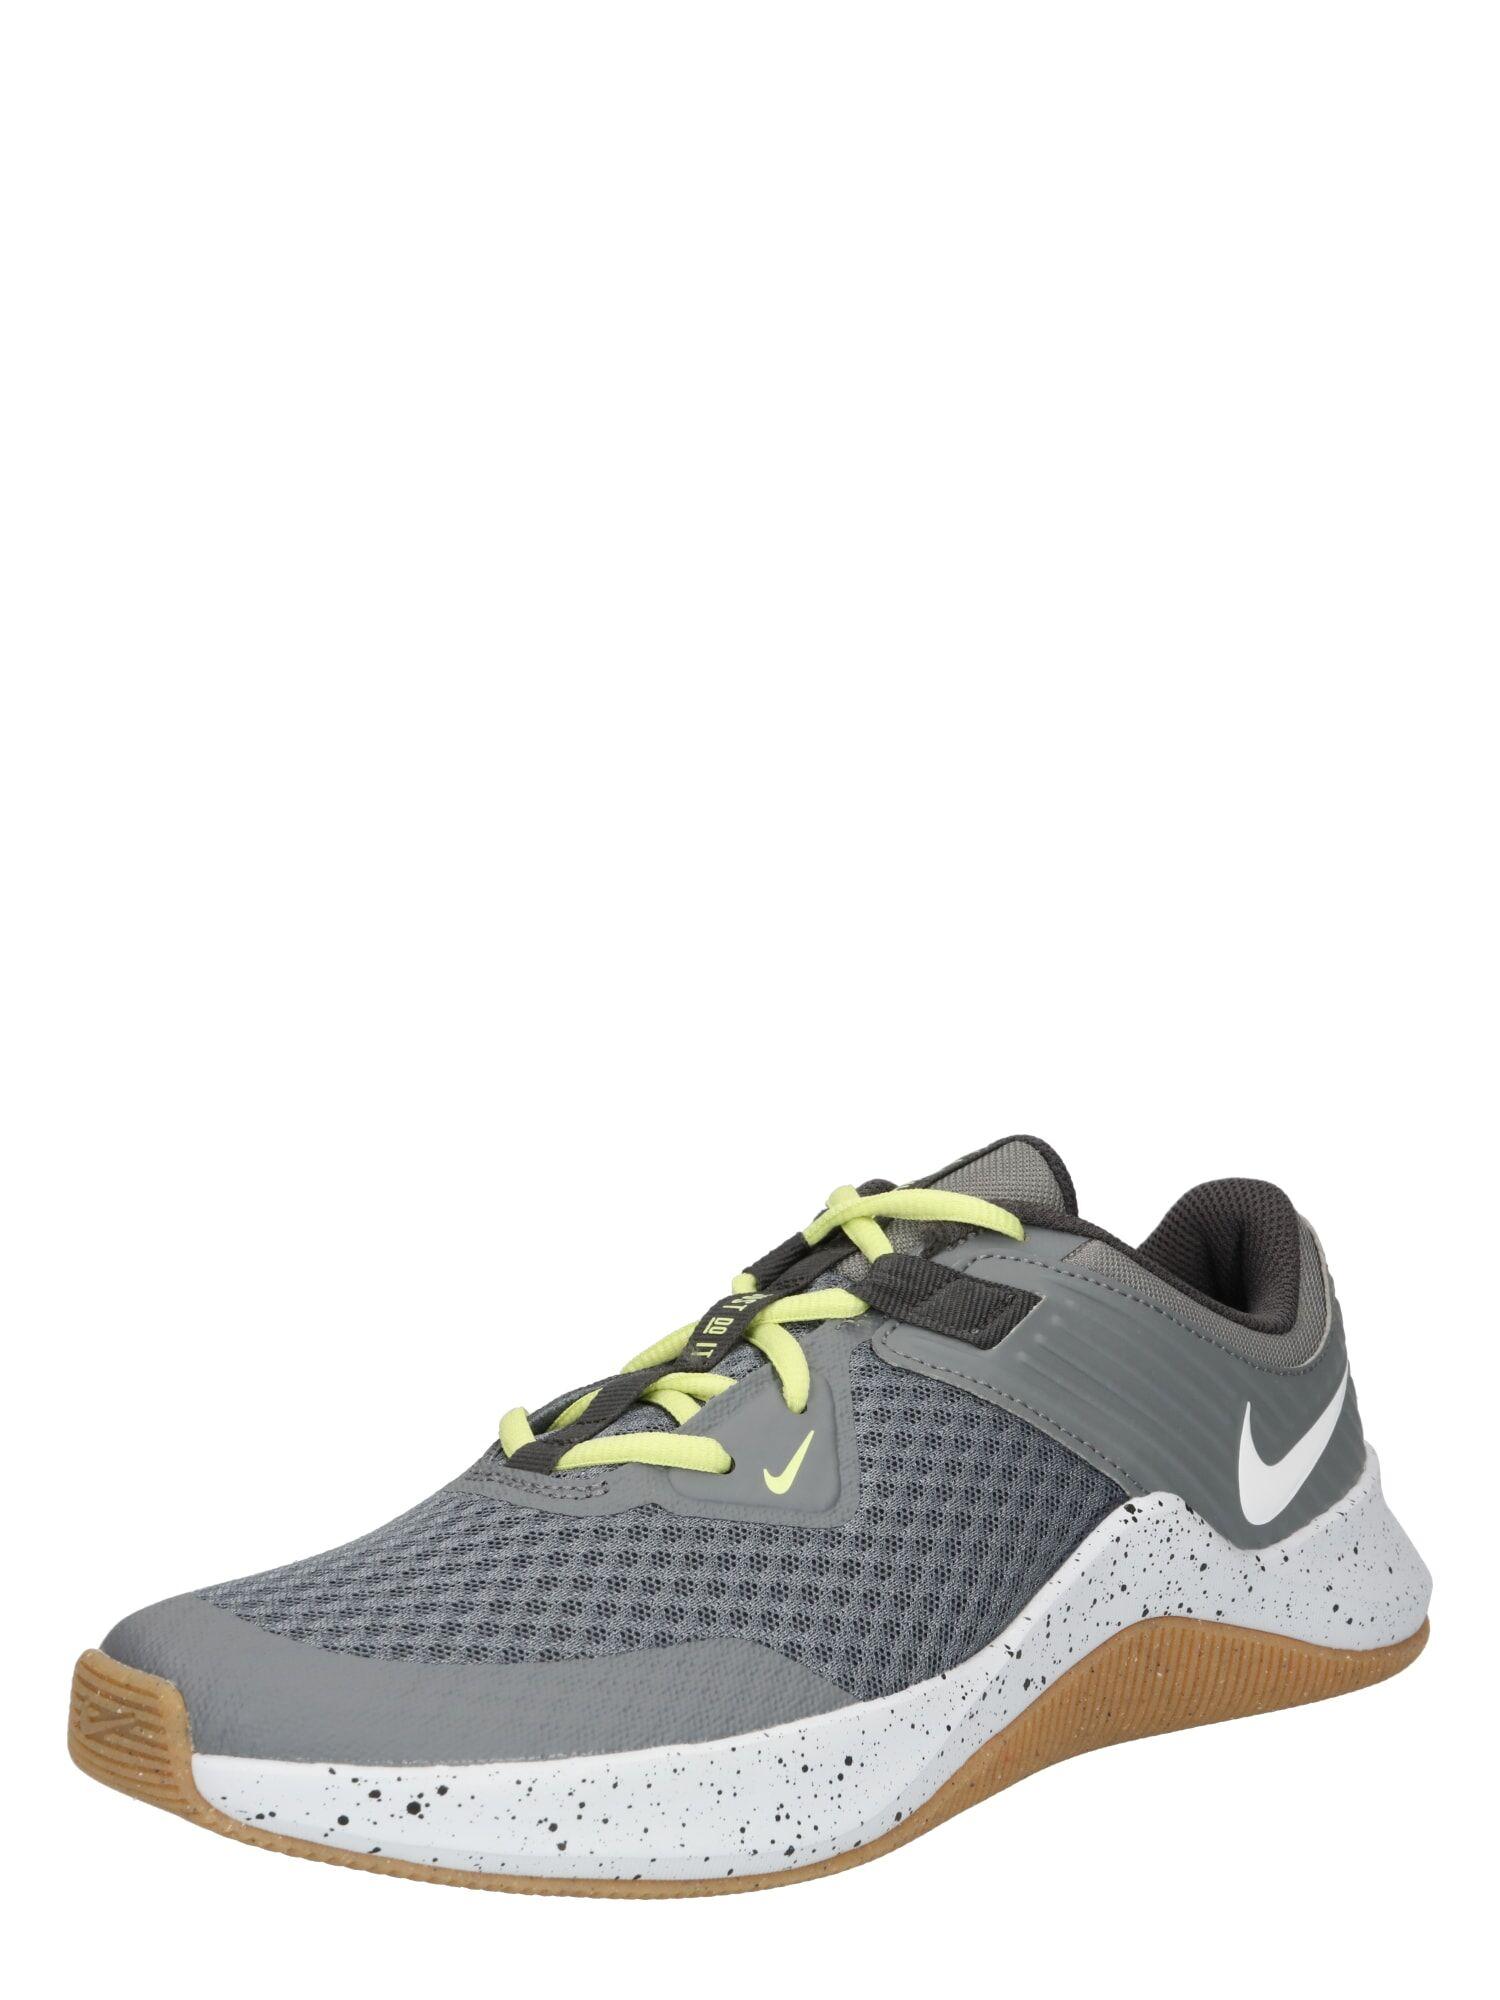 NIKE Chaussure de sport 'MC Trainer'  - Gris - Taille: 9.5 - male